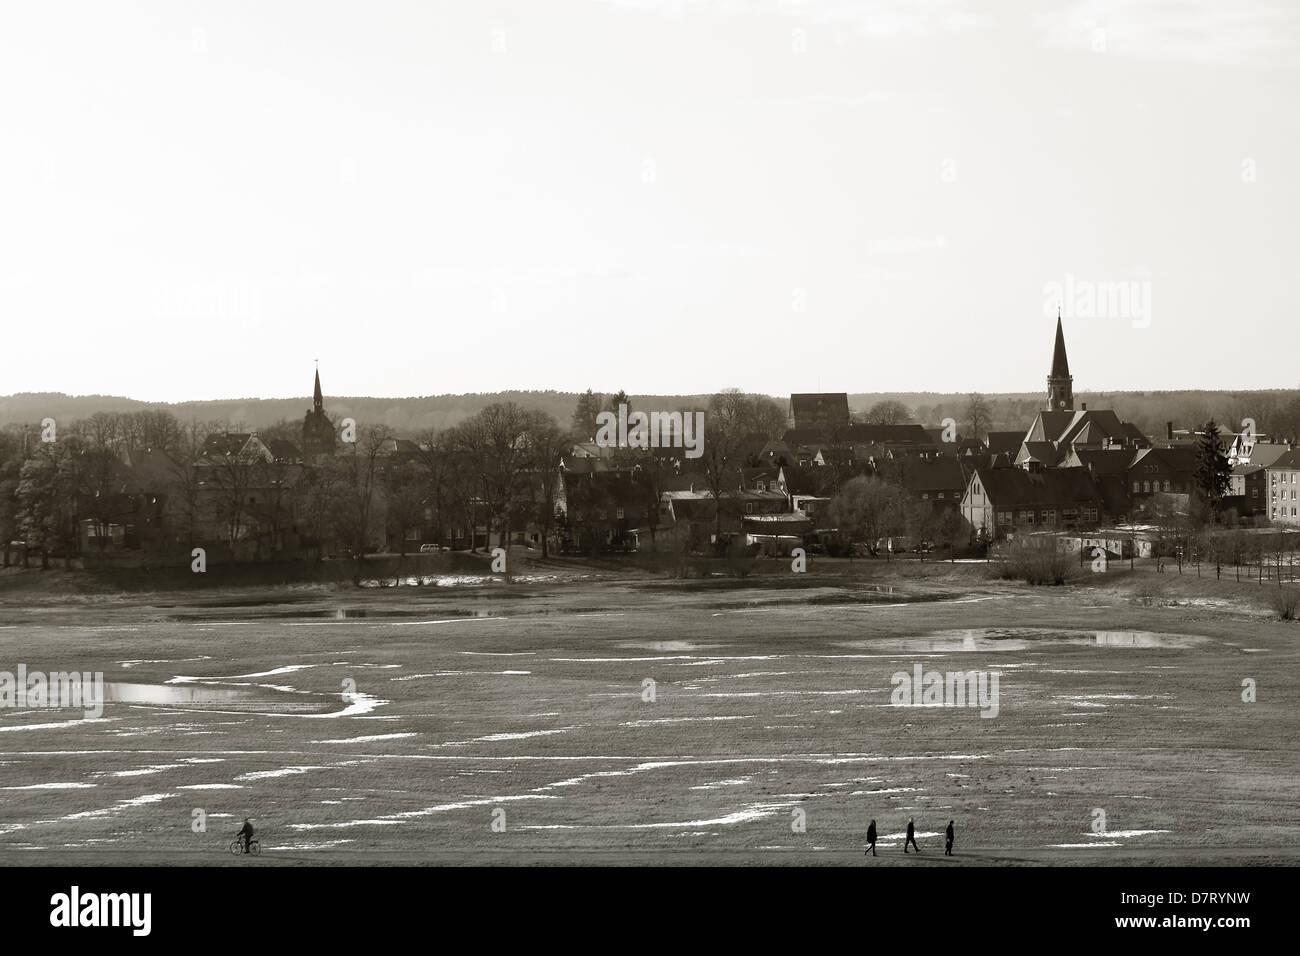 City of Dömitz - Stock Image